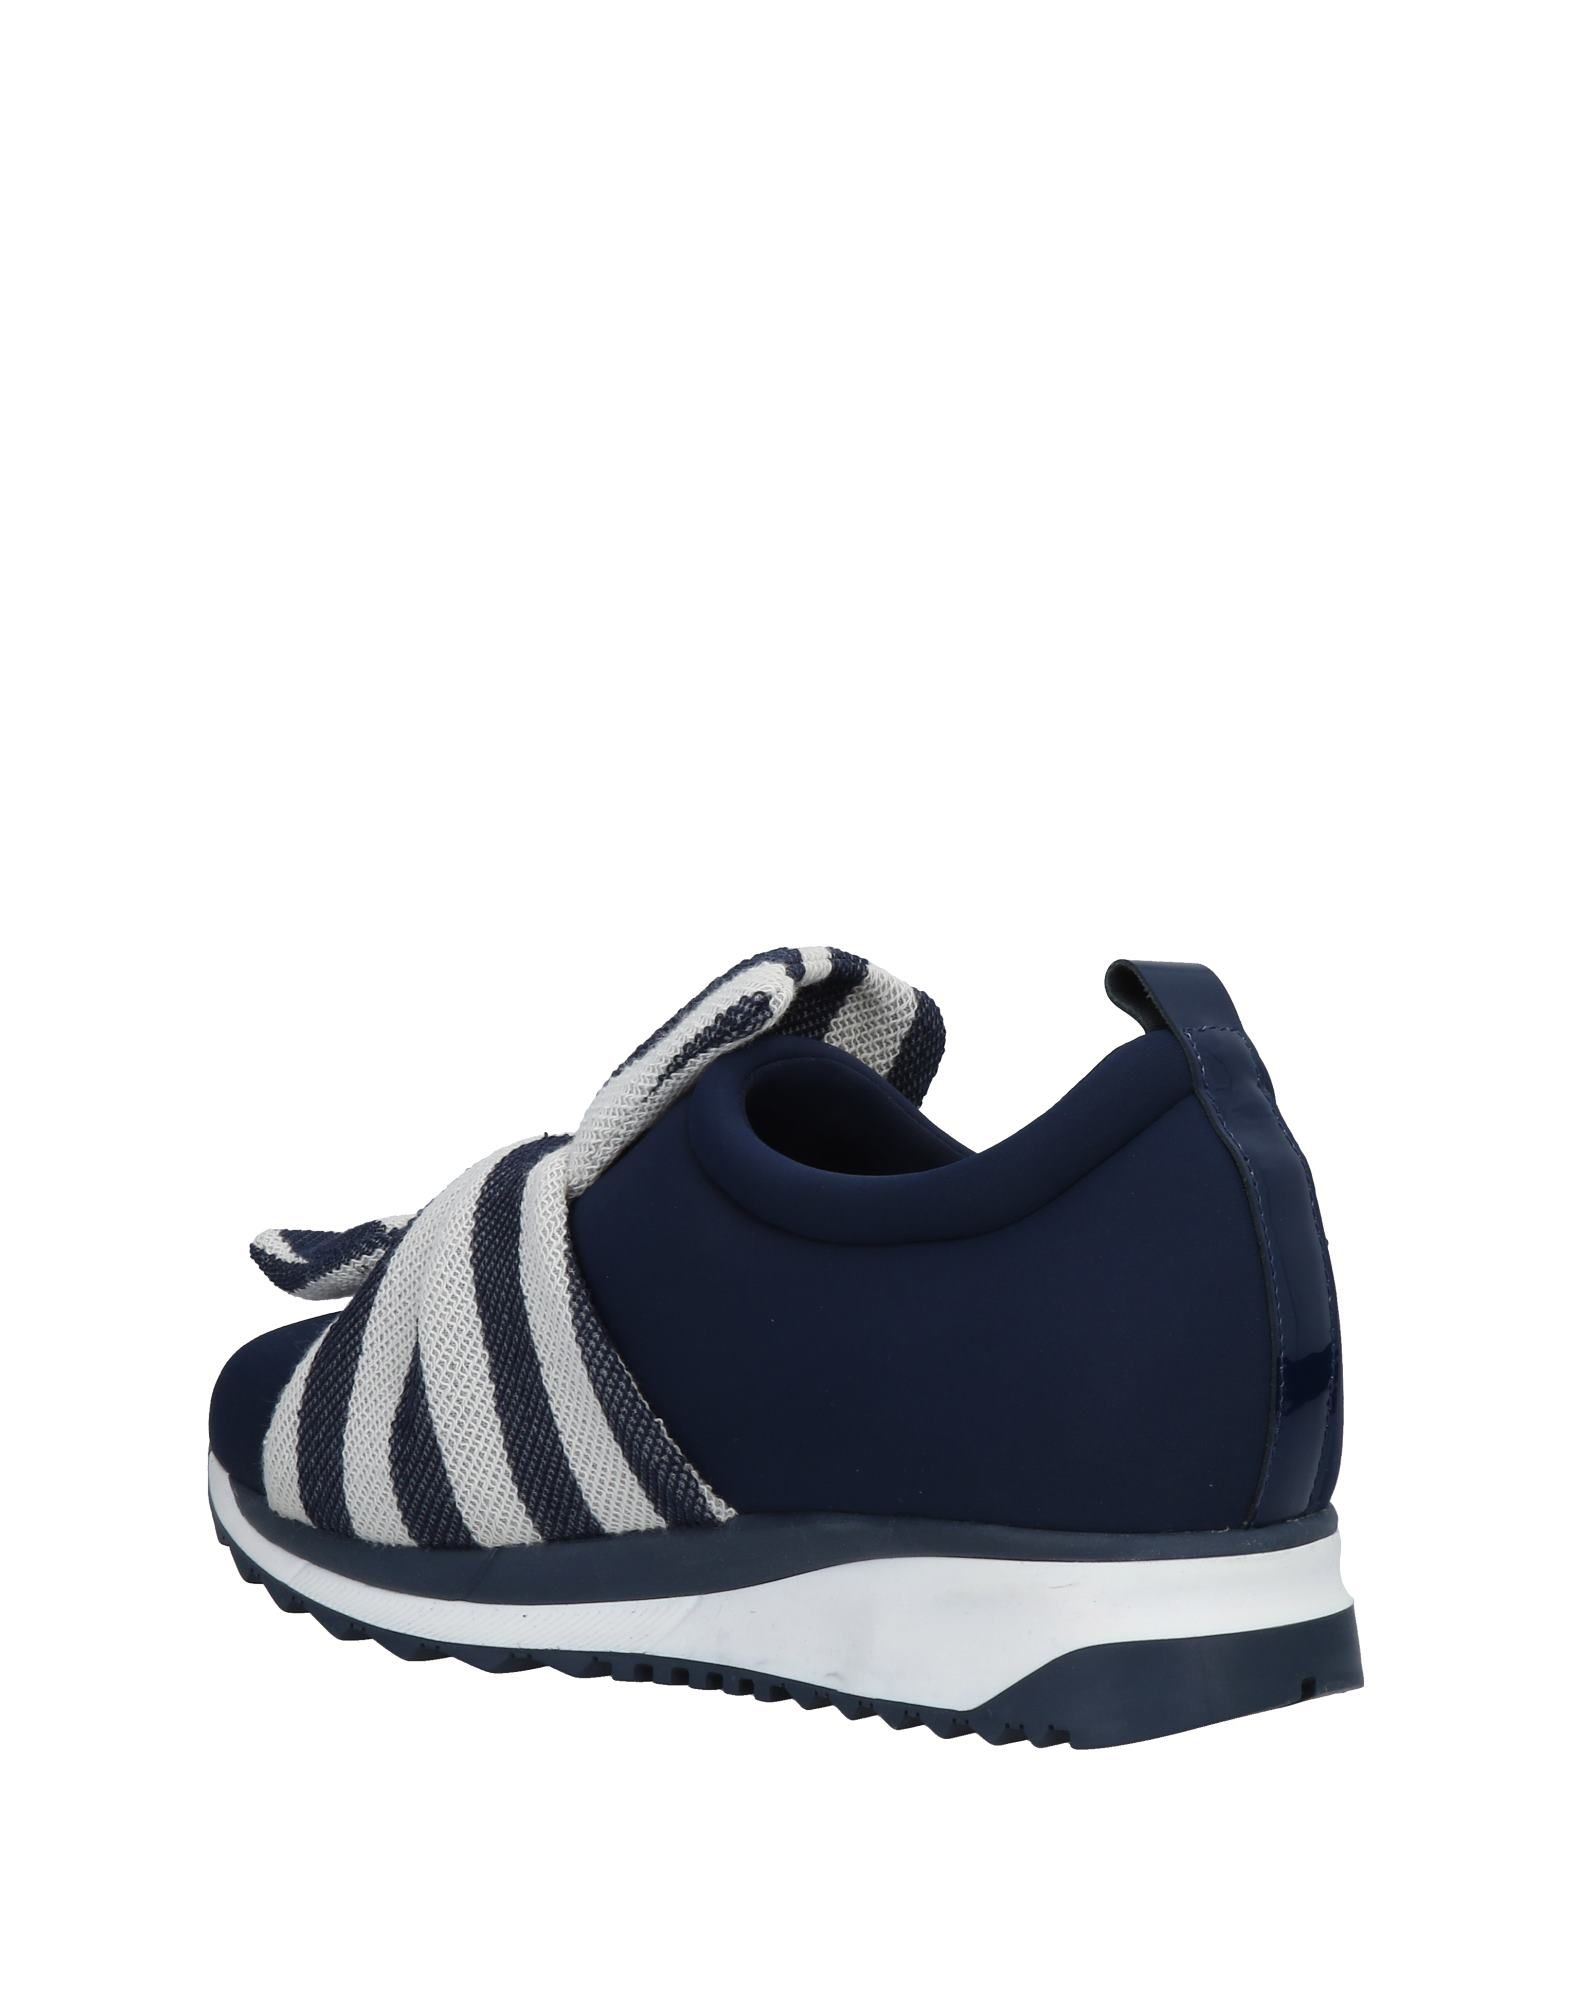 Atos 11486217UW Lombardini Sneakers Damen  11486217UW Atos Gute Qualität beliebte Schuhe 6acb8b